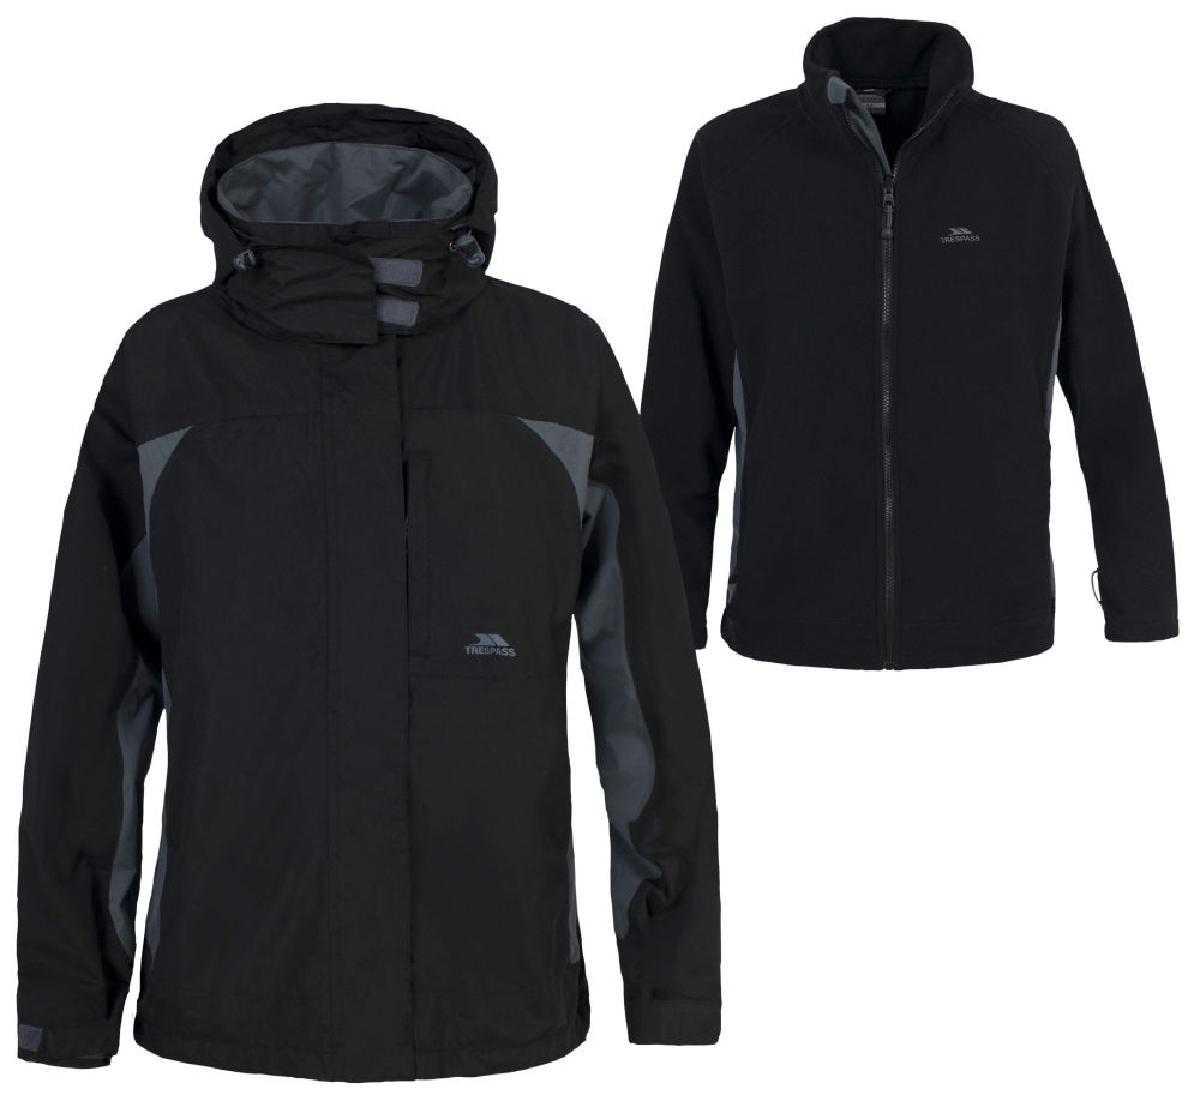 Girls-3-in-1-Trespass-Waterproof-Jacket-Fleece-Raincoats-Black-Age-9